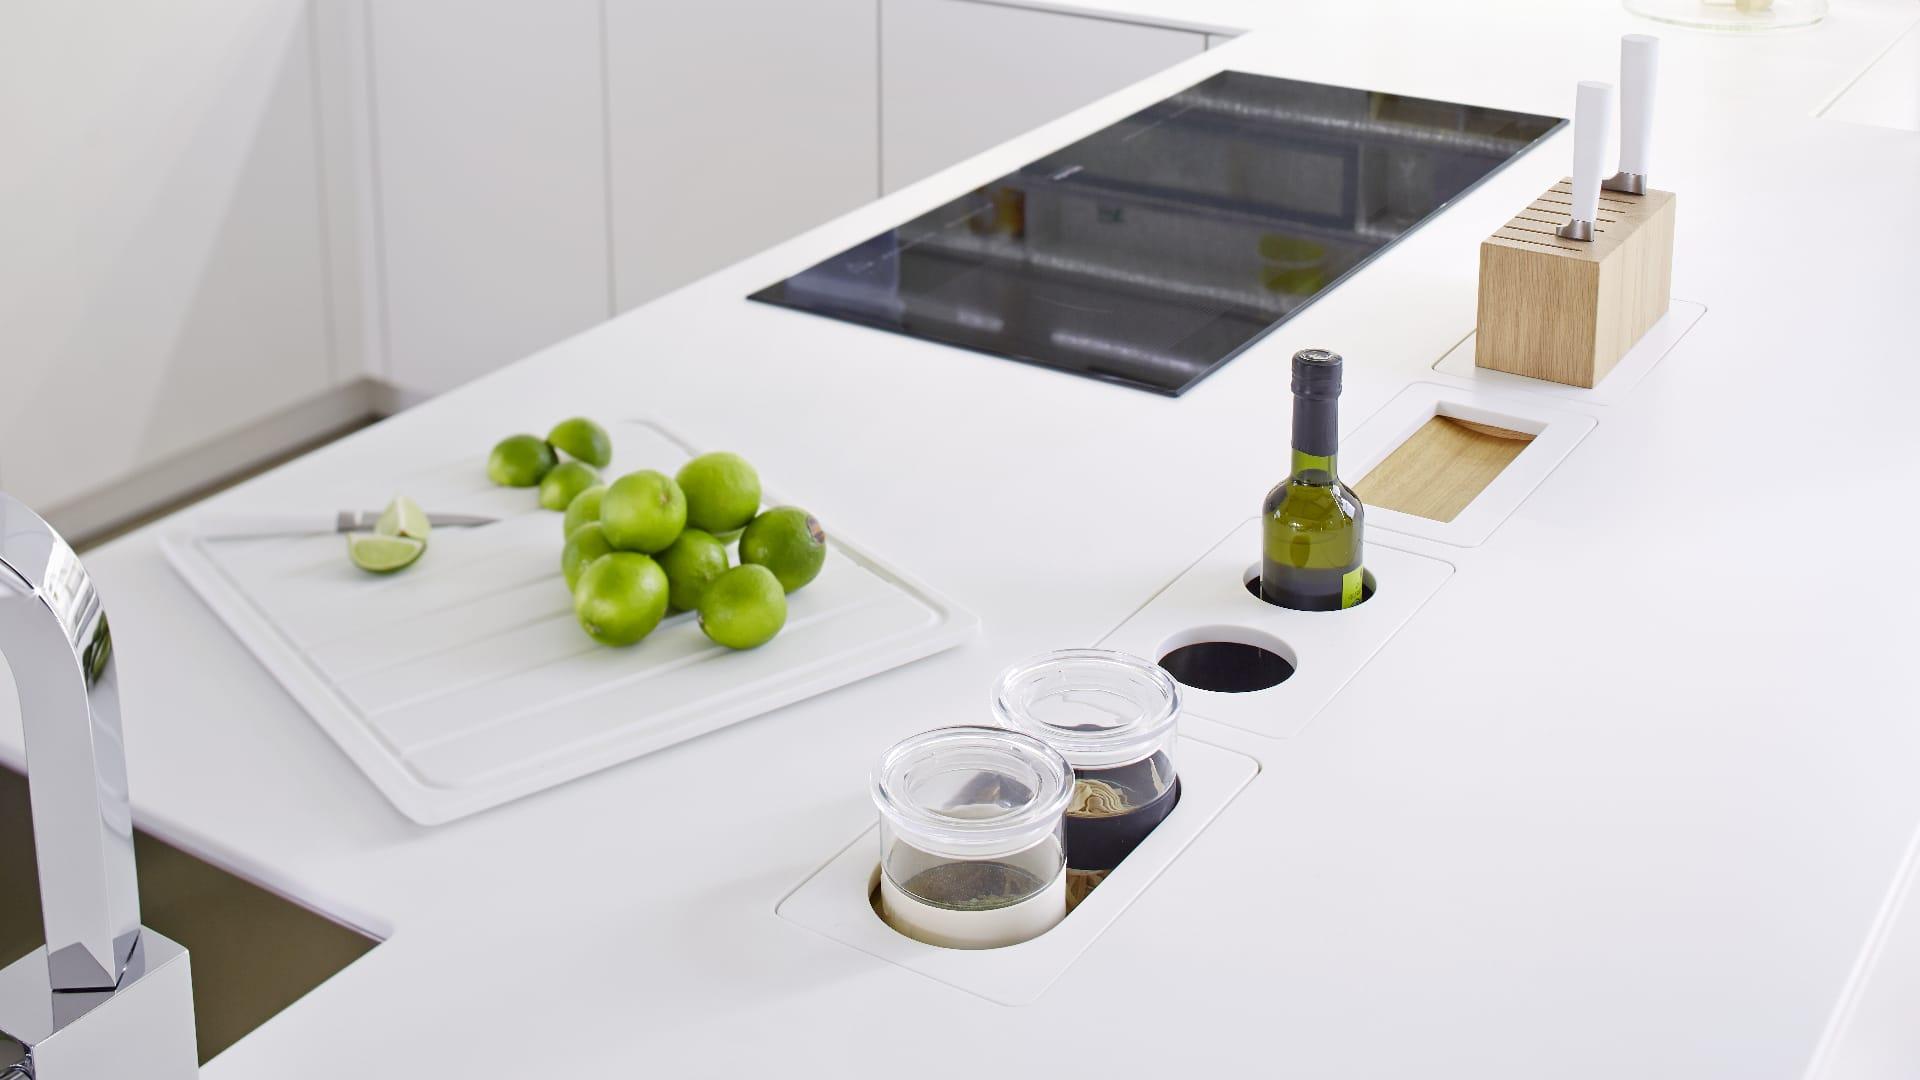 dietzproduktgestaltung produktdesign m beldesign messestandgestaltung fotoarchitektur 3d. Black Bedroom Furniture Sets. Home Design Ideas